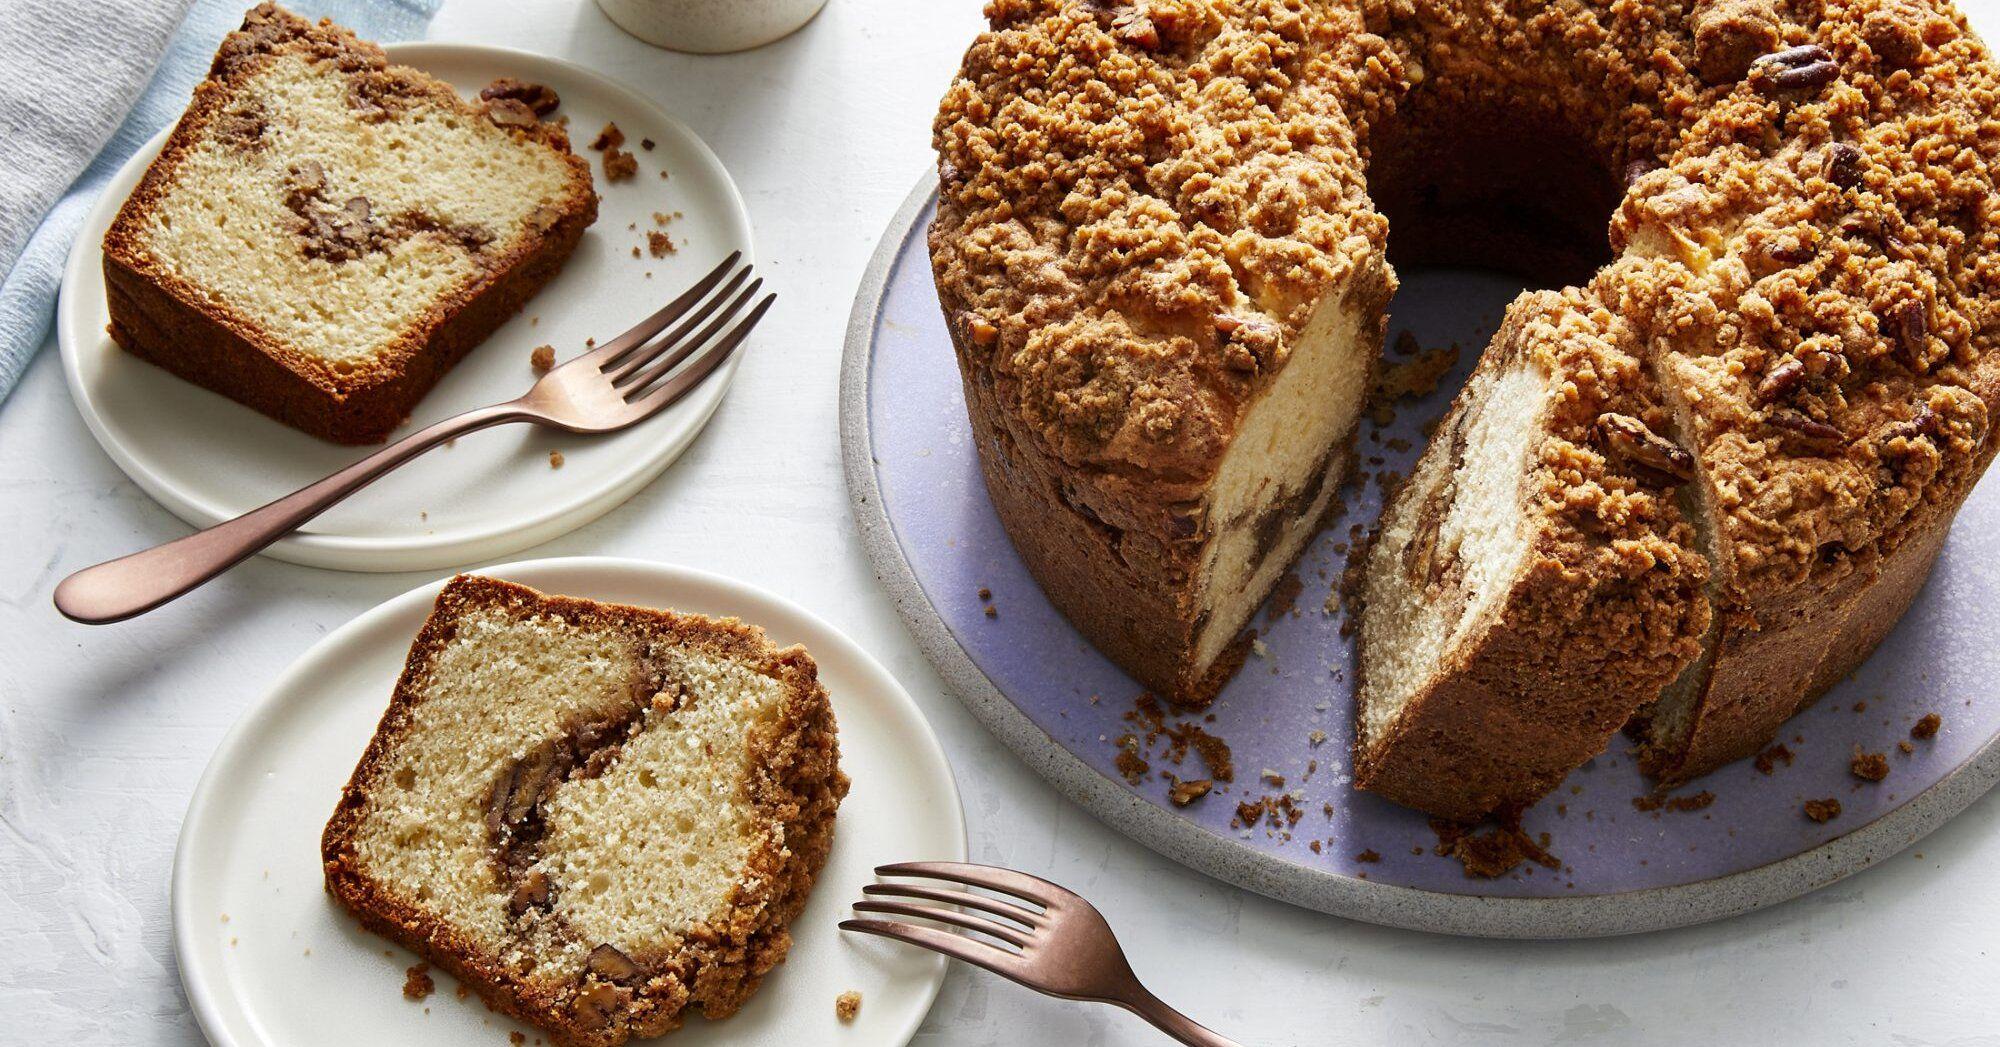 Cinnamon Coffee Cake Recipe Recipe In 2020 Coffee Cake Recipes Desserts Cinnamon Coffee Cake